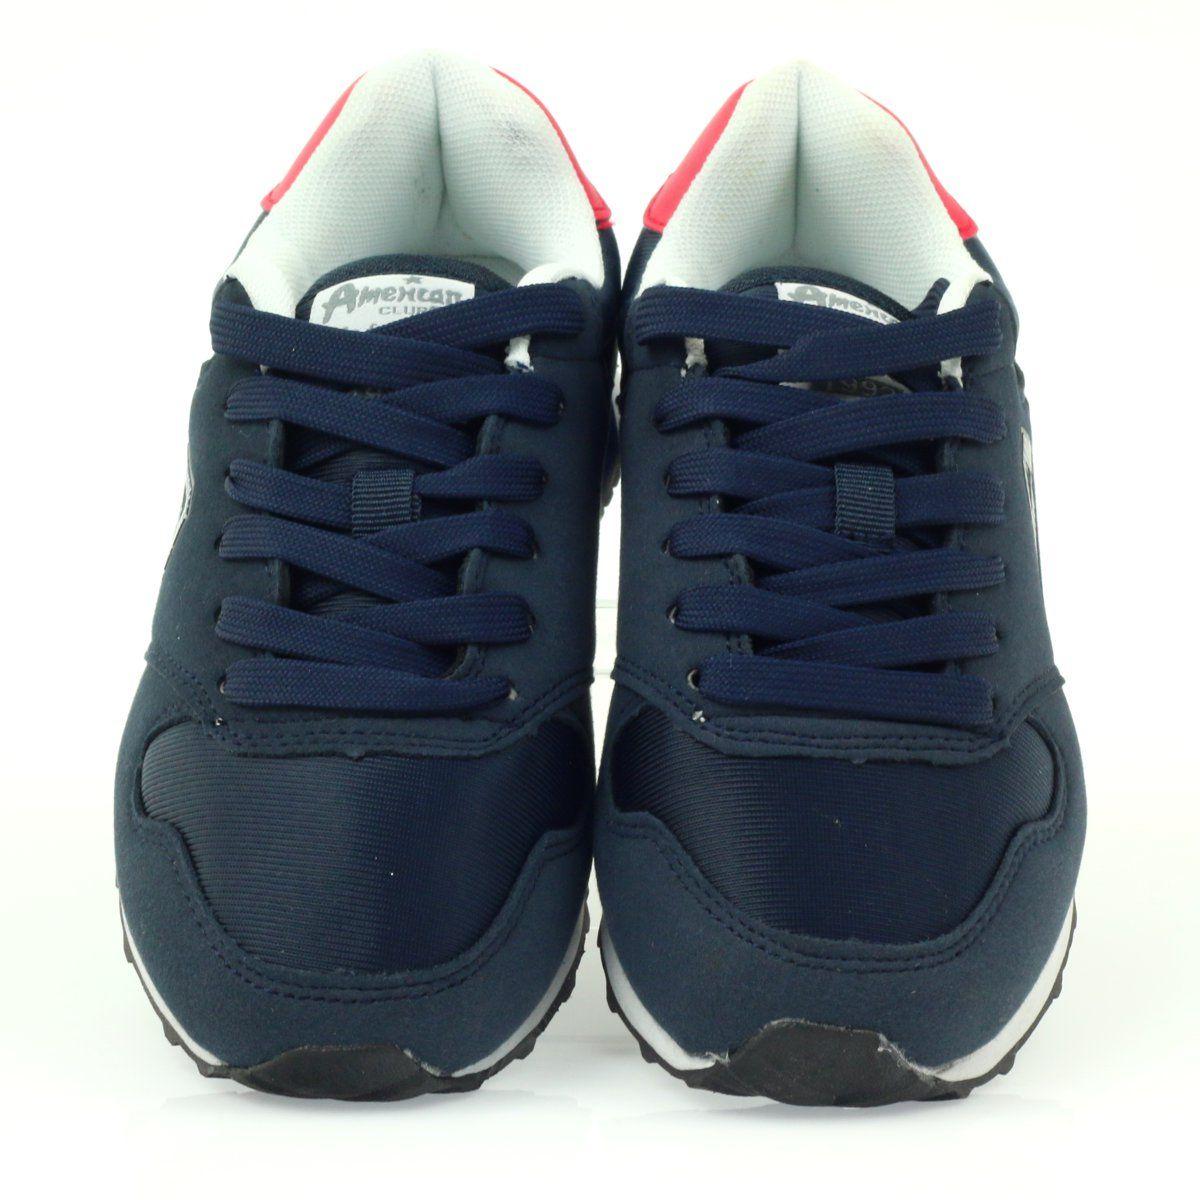 American Club American Adi Sports Shoes For Children 1757 Kid Shoes Sports Shoes Club Shoes